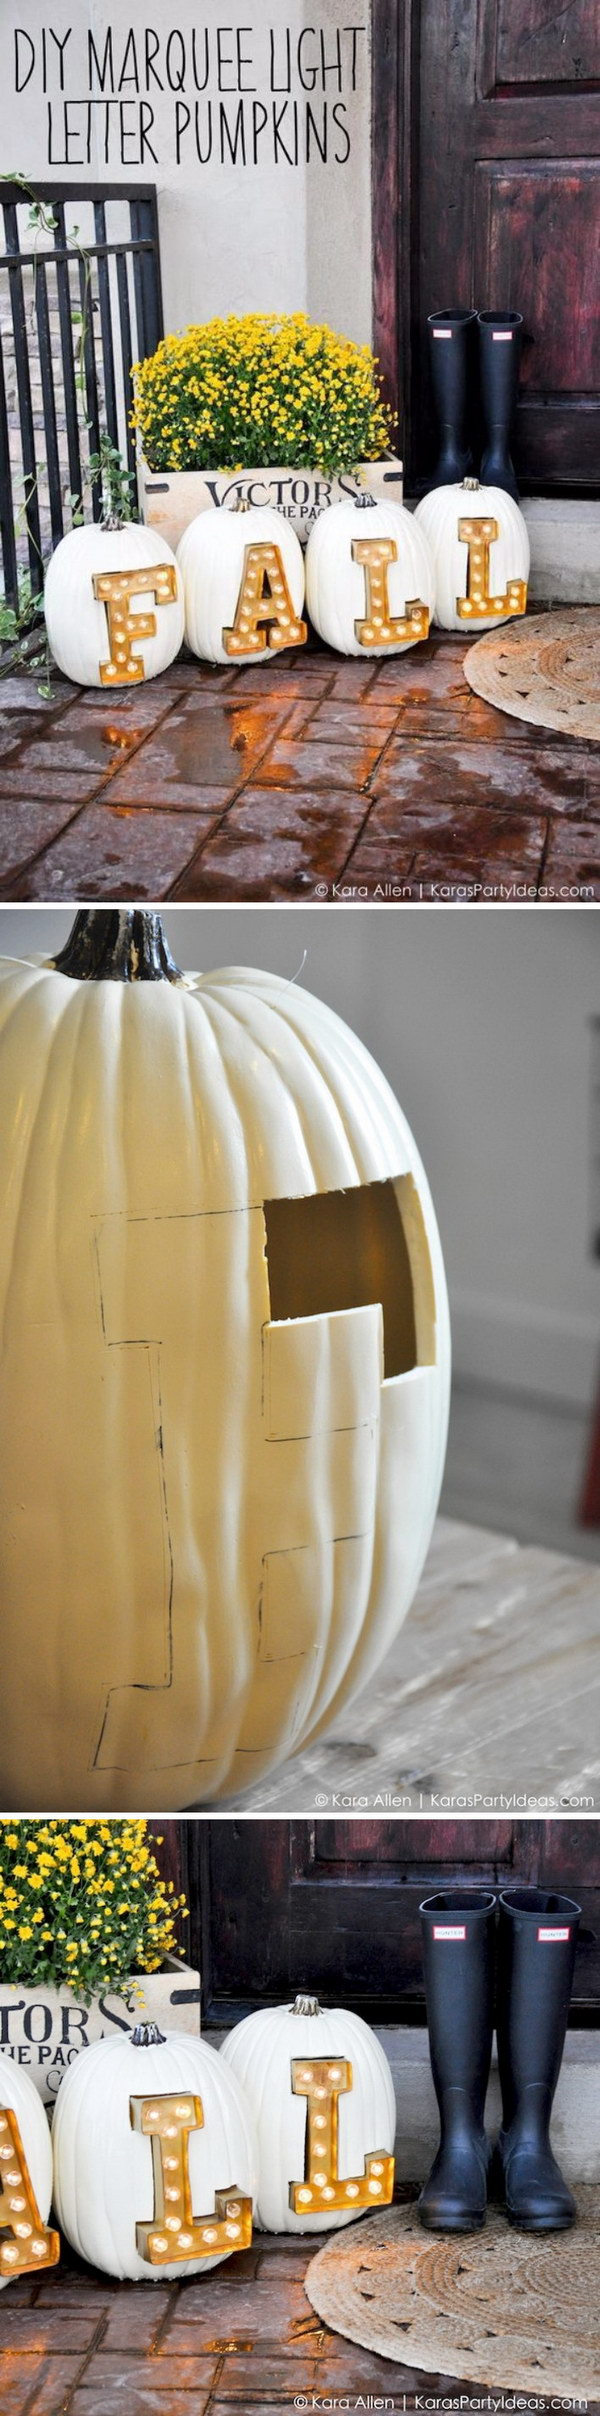 DIY Marquee Light Fall + Halloween Pumpkin Letters.